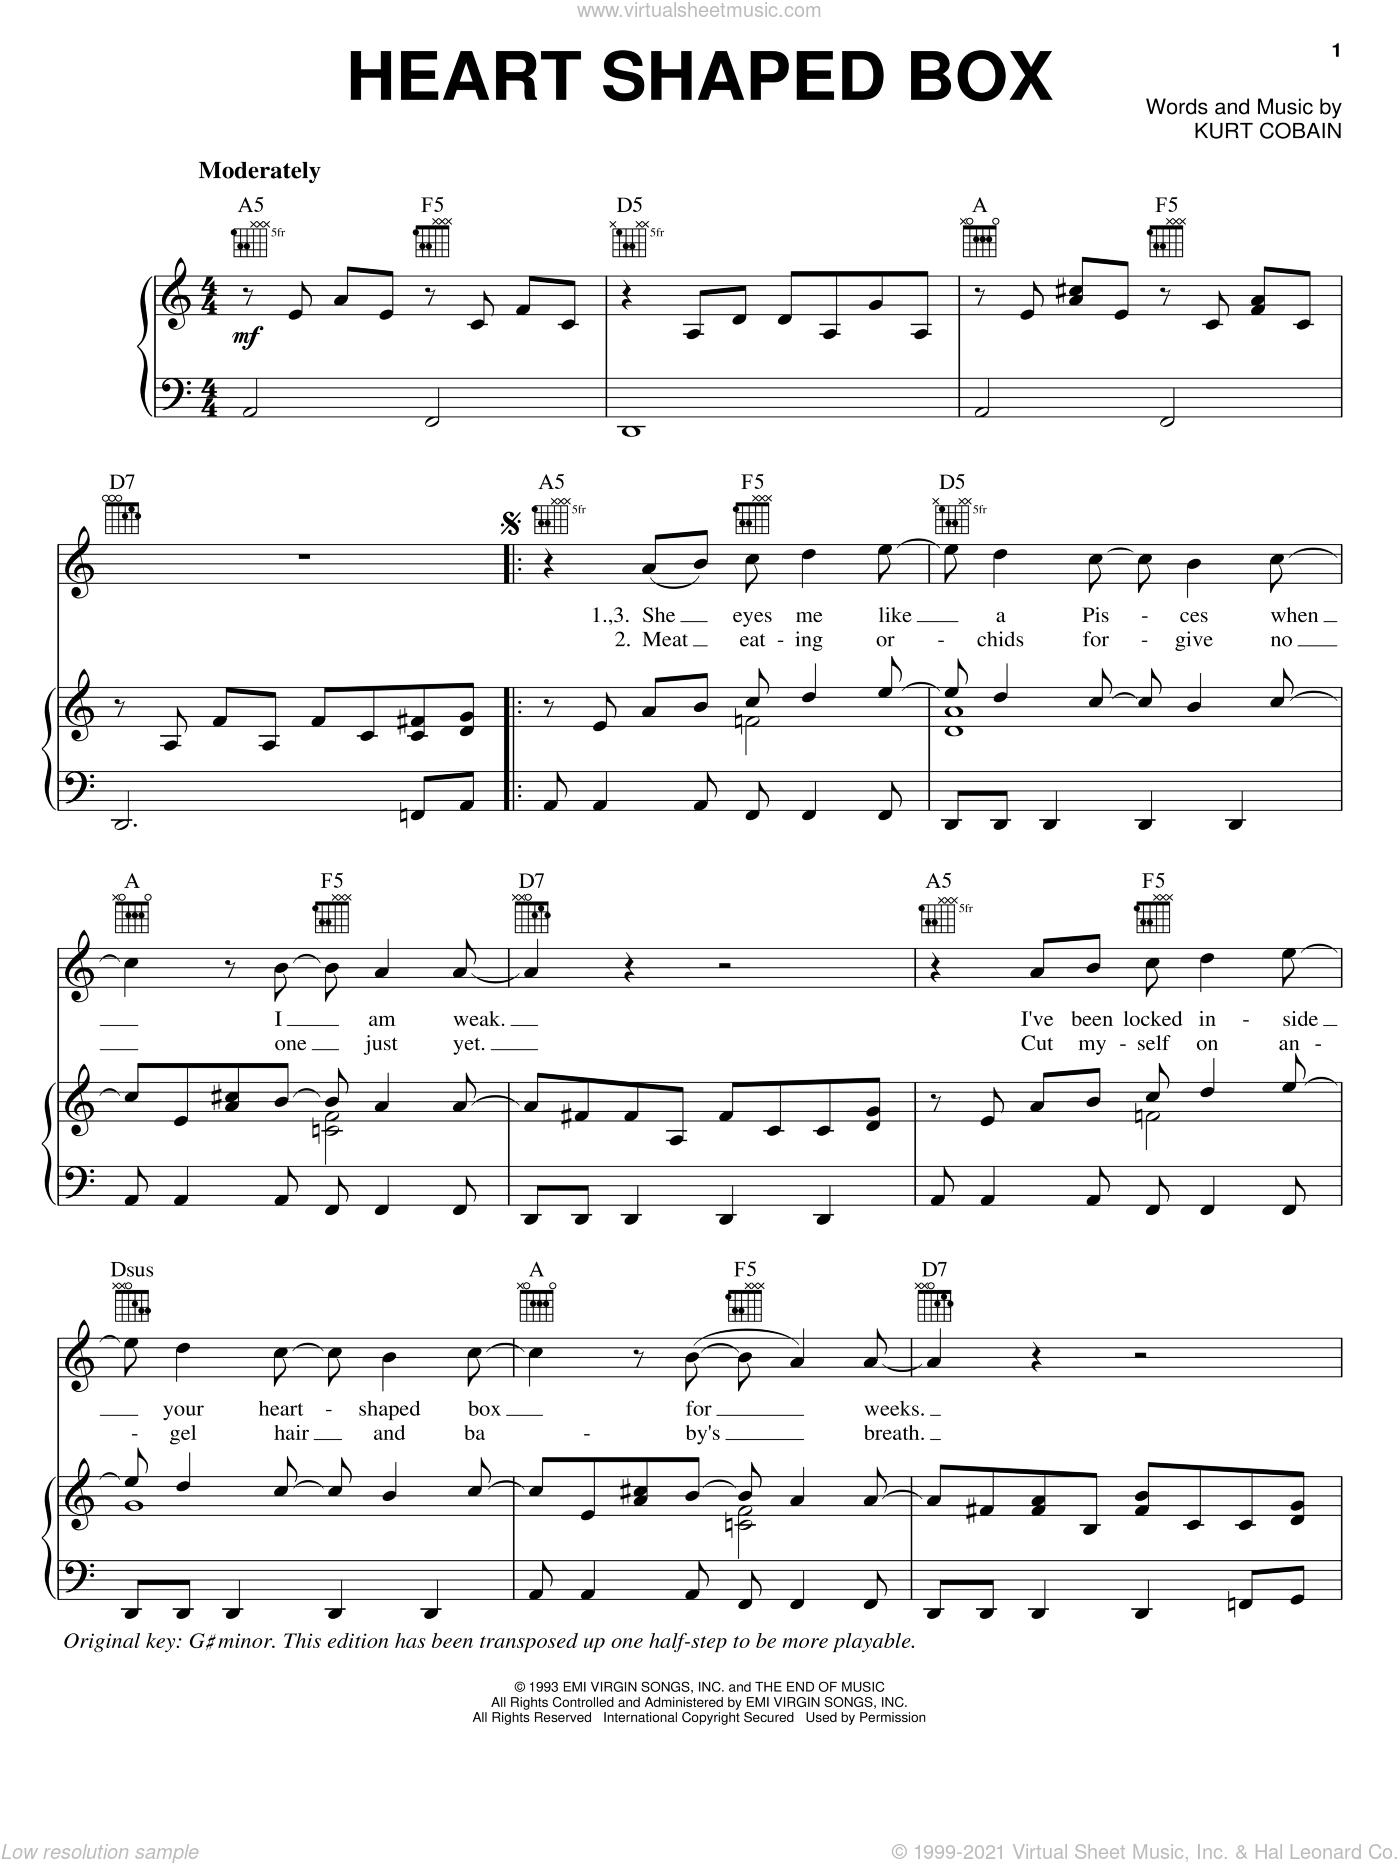 Heart Shaped Box sheet music for voice, piano or guitar by Nirvana and Kurt Cobain, intermediate skill level